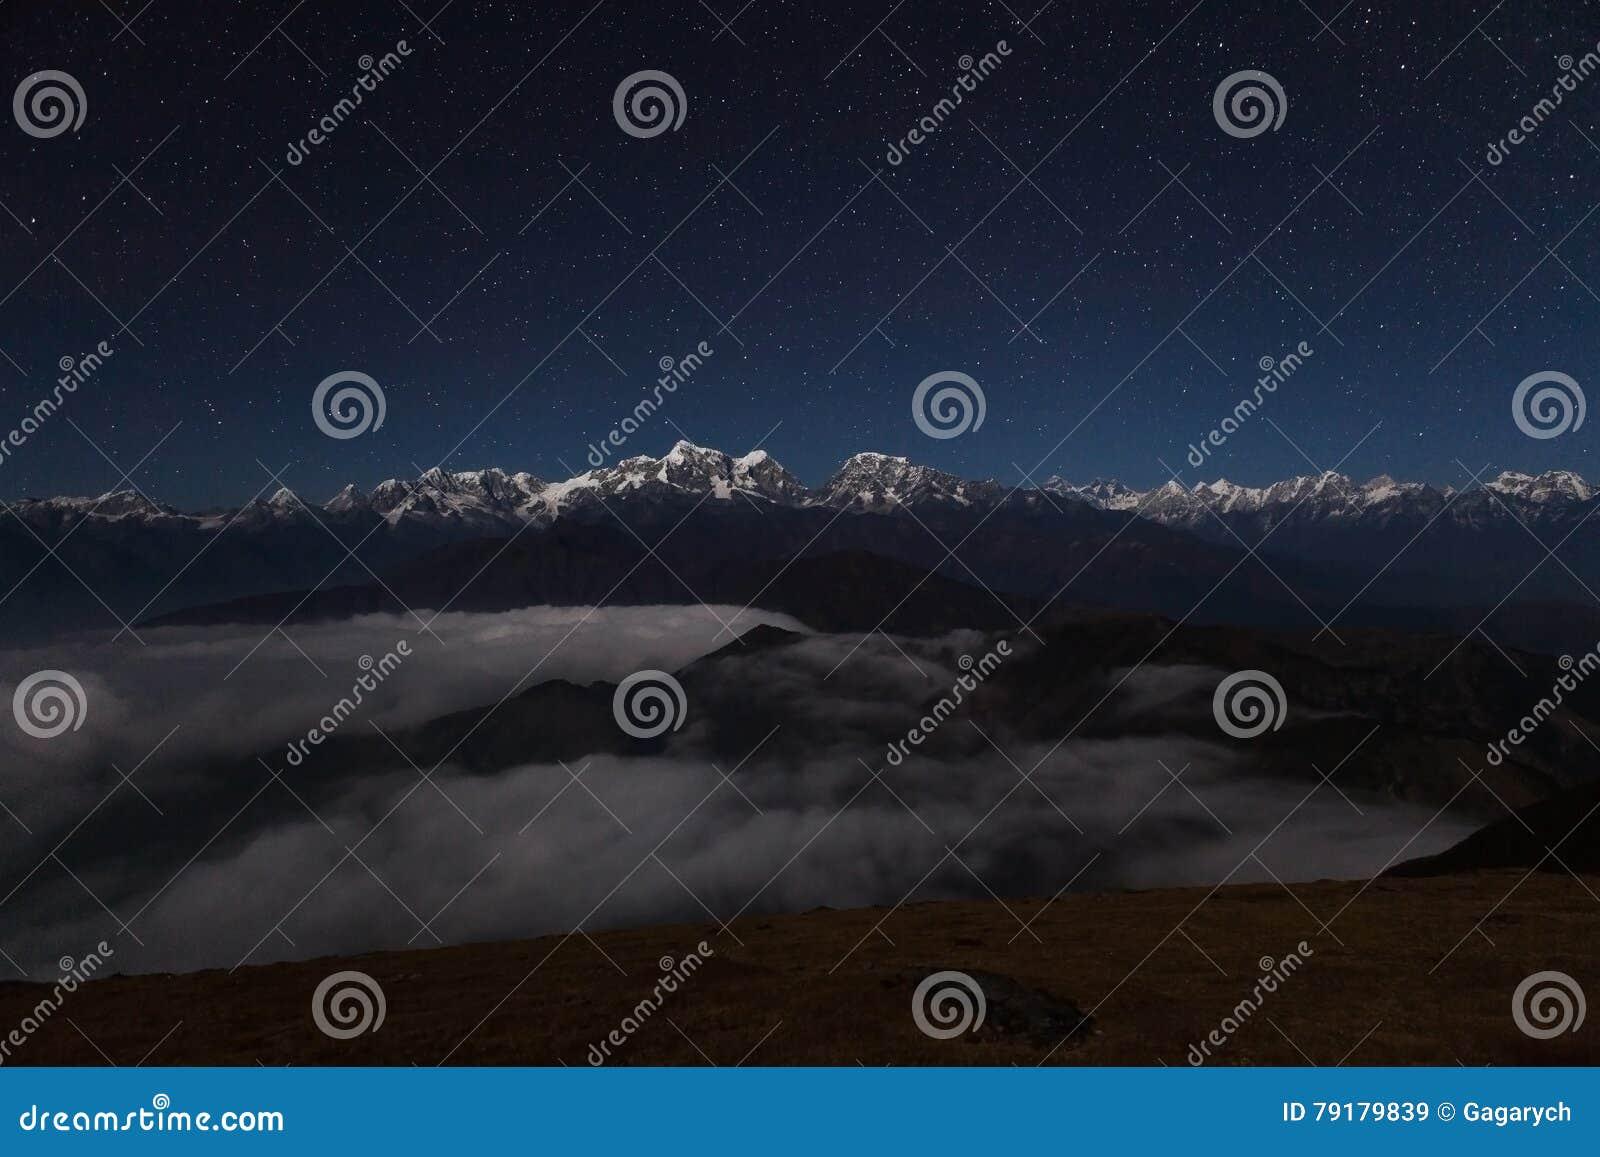 Night mountain landscape on a starry night.